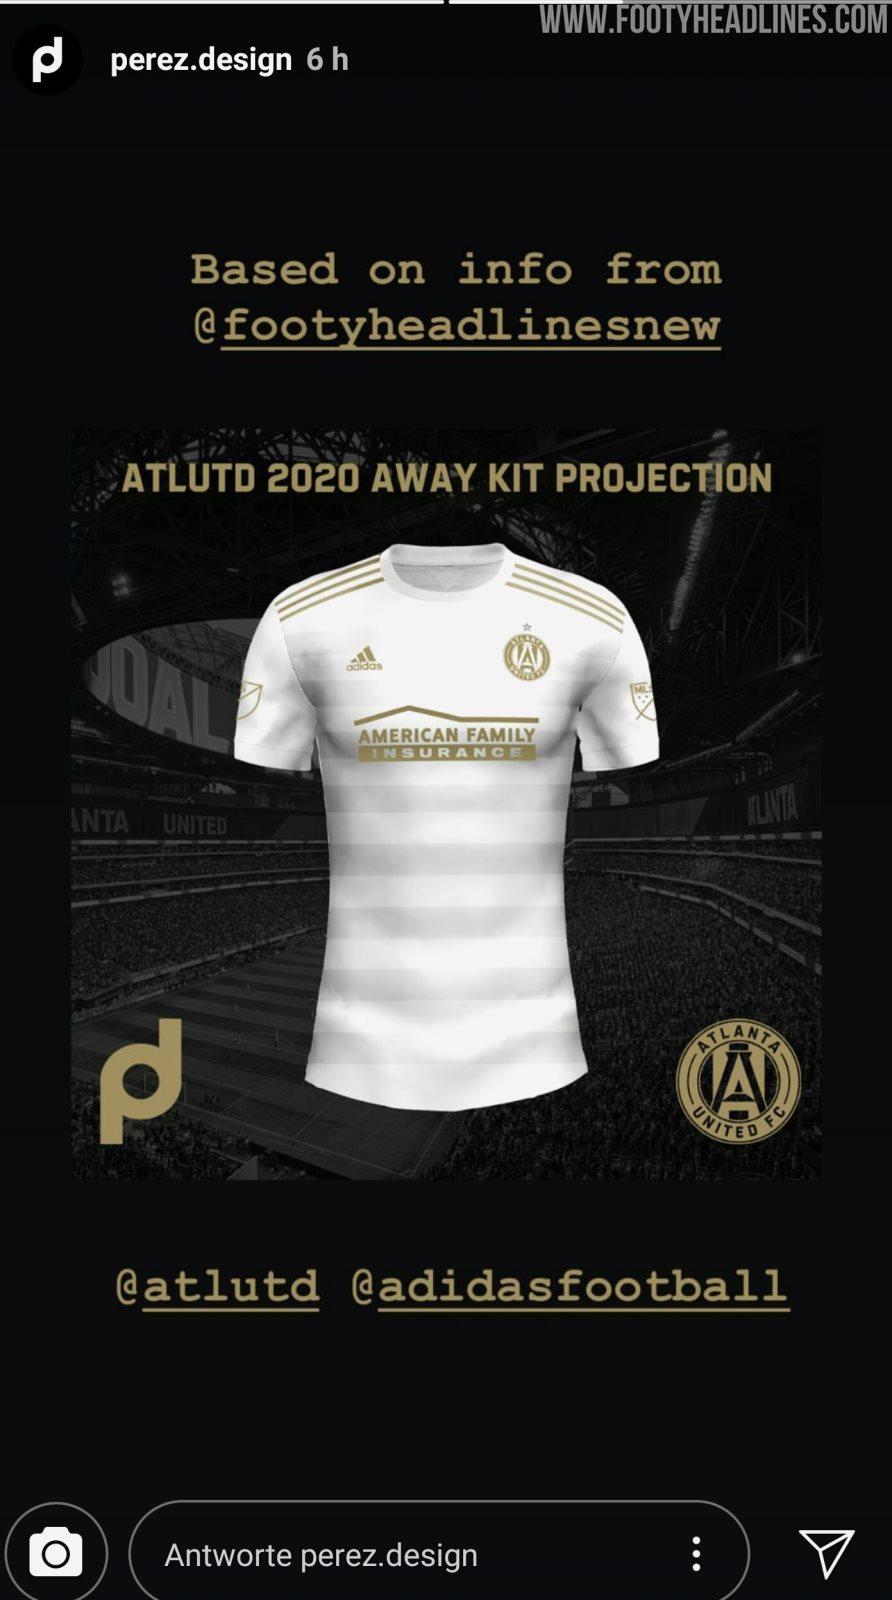 Atlanta United Schedule 2020 LEAKED: Atlanta United 2020 Away Kit Colors, Info & Prediction